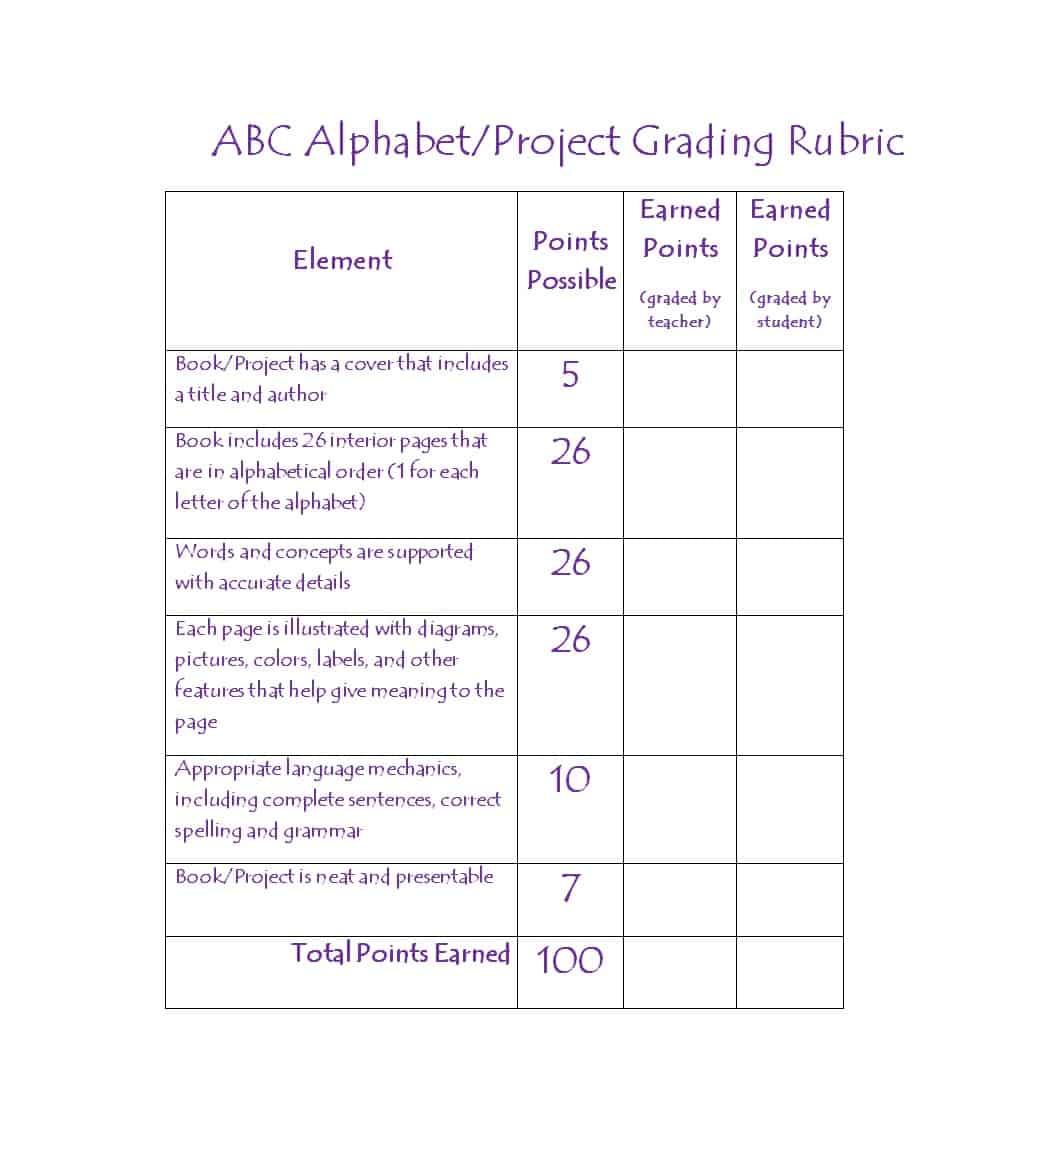 46 Editable Rubric Templates (Word Format) - Template Lab - Free Printable Blank Rubrics